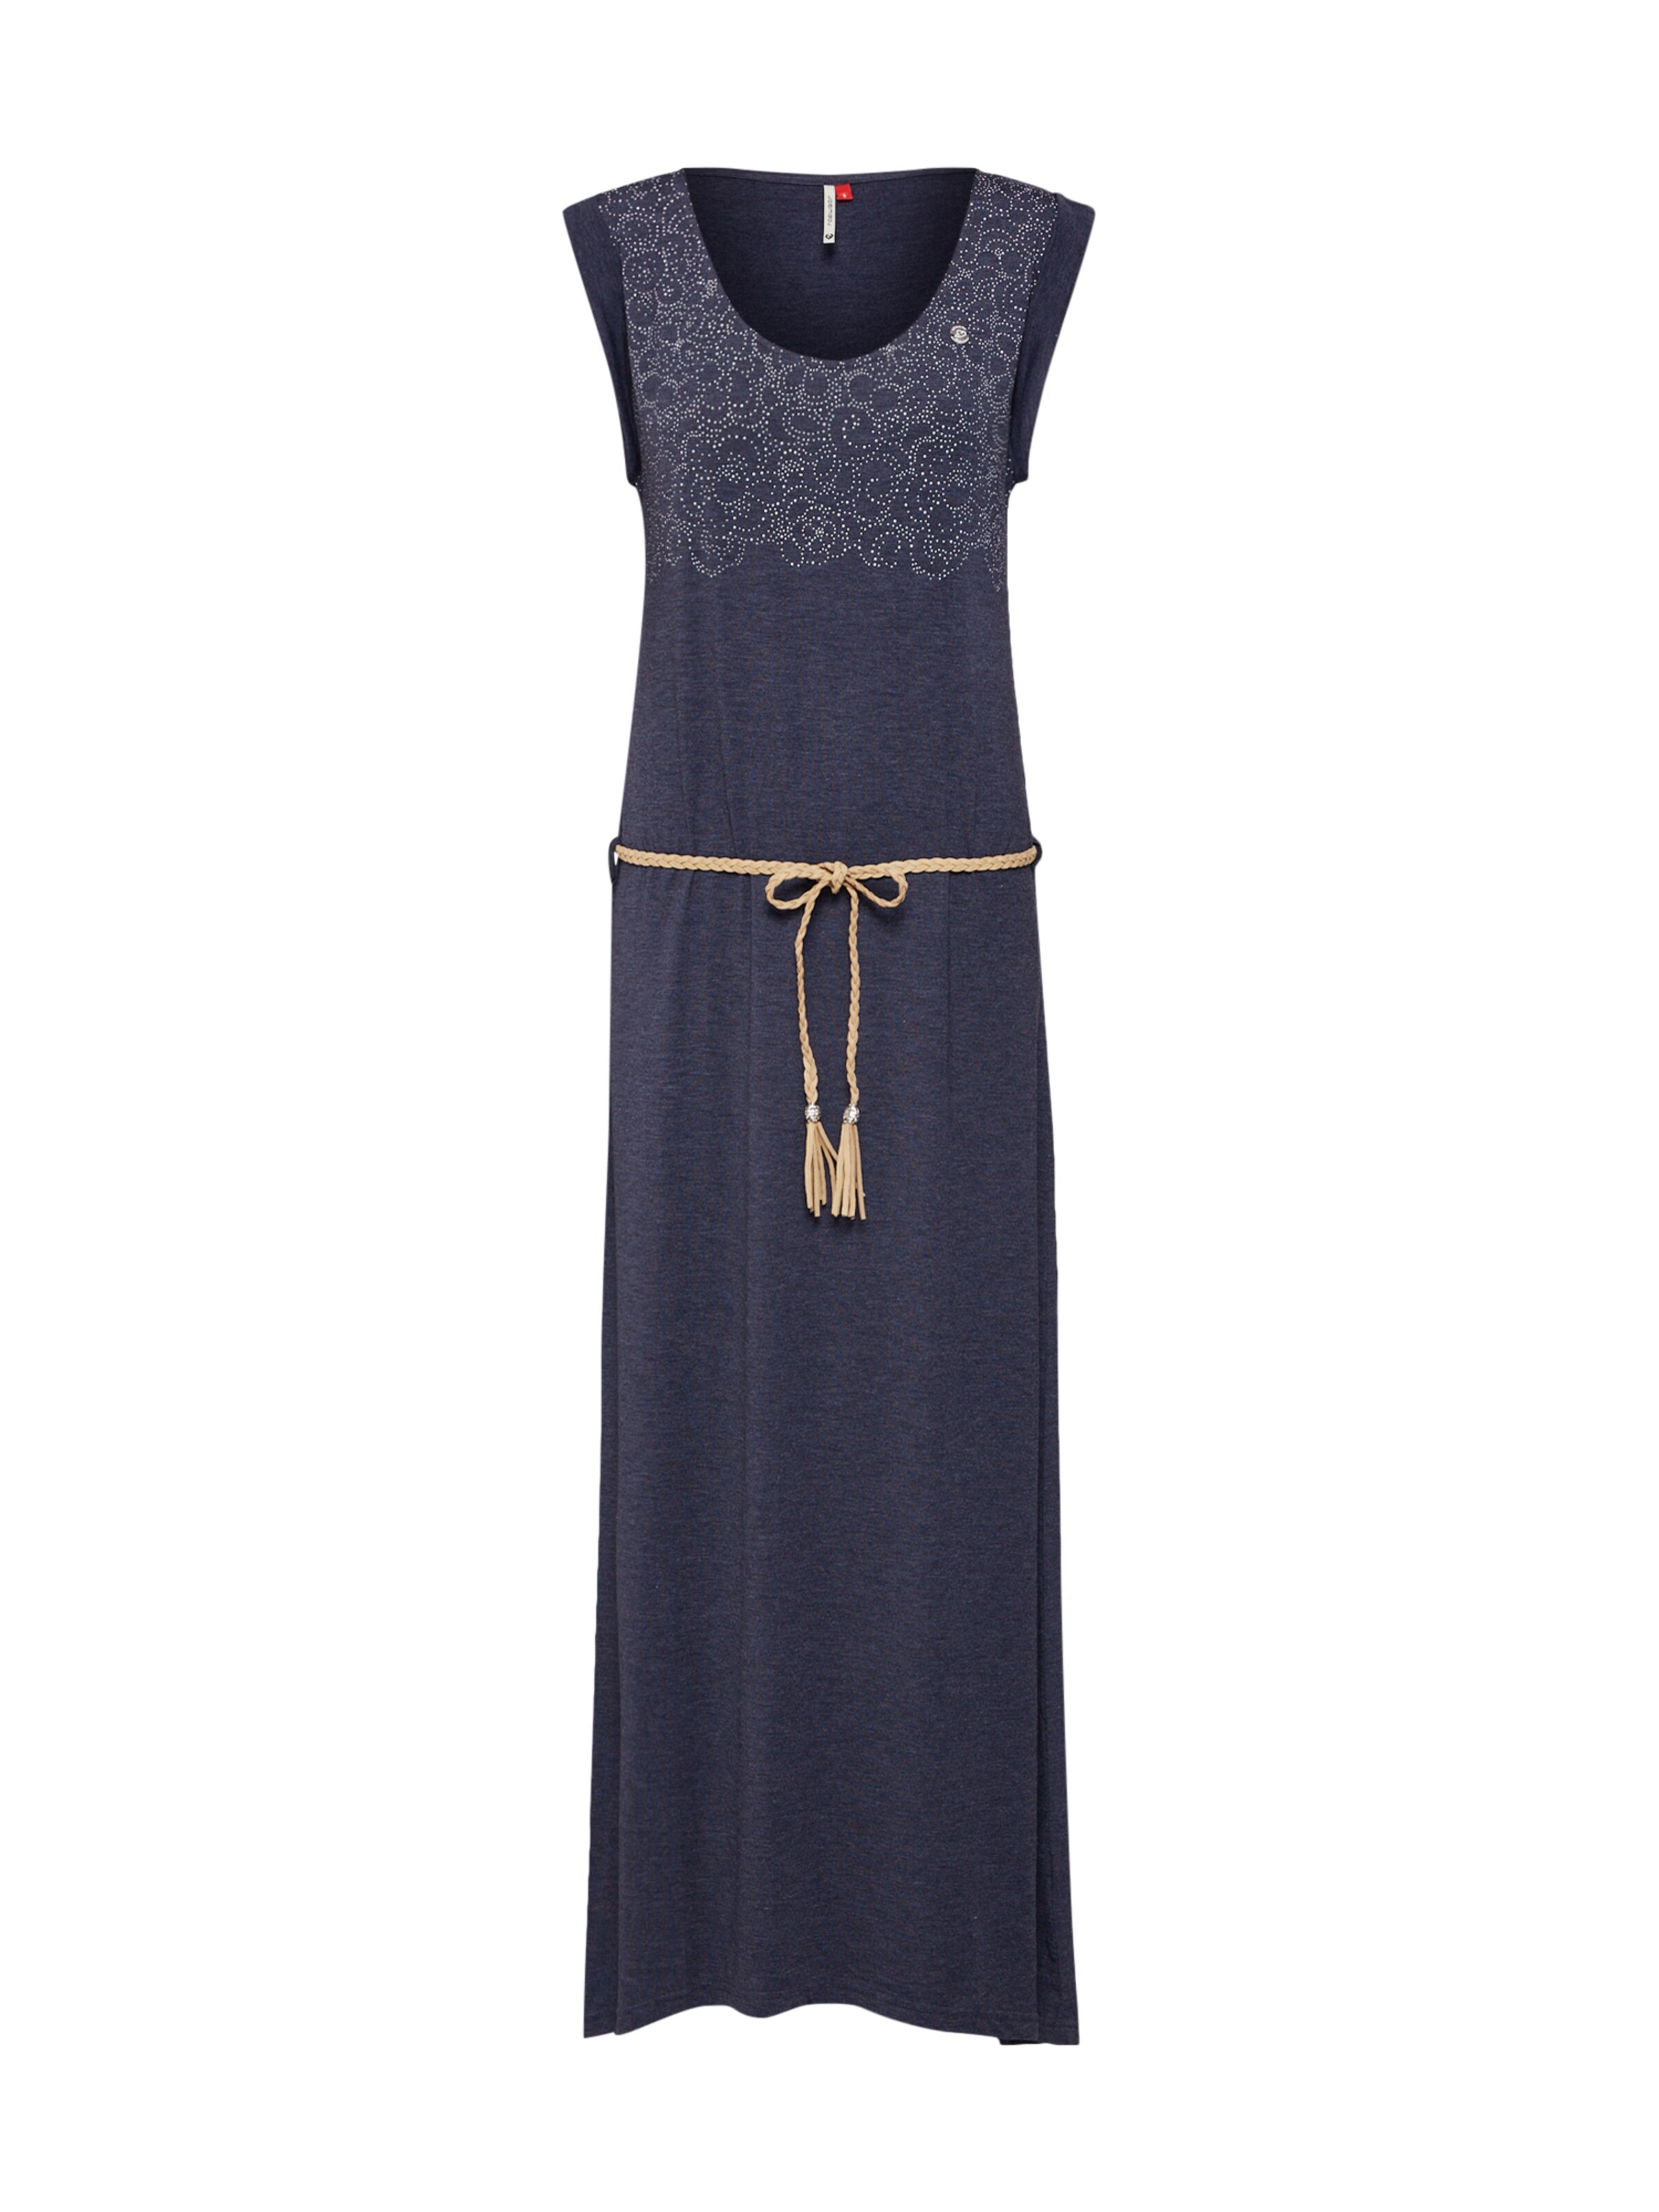 Long Kleid UltramarinblauWeiß B' 'tag In Ragwear cTlFJK1